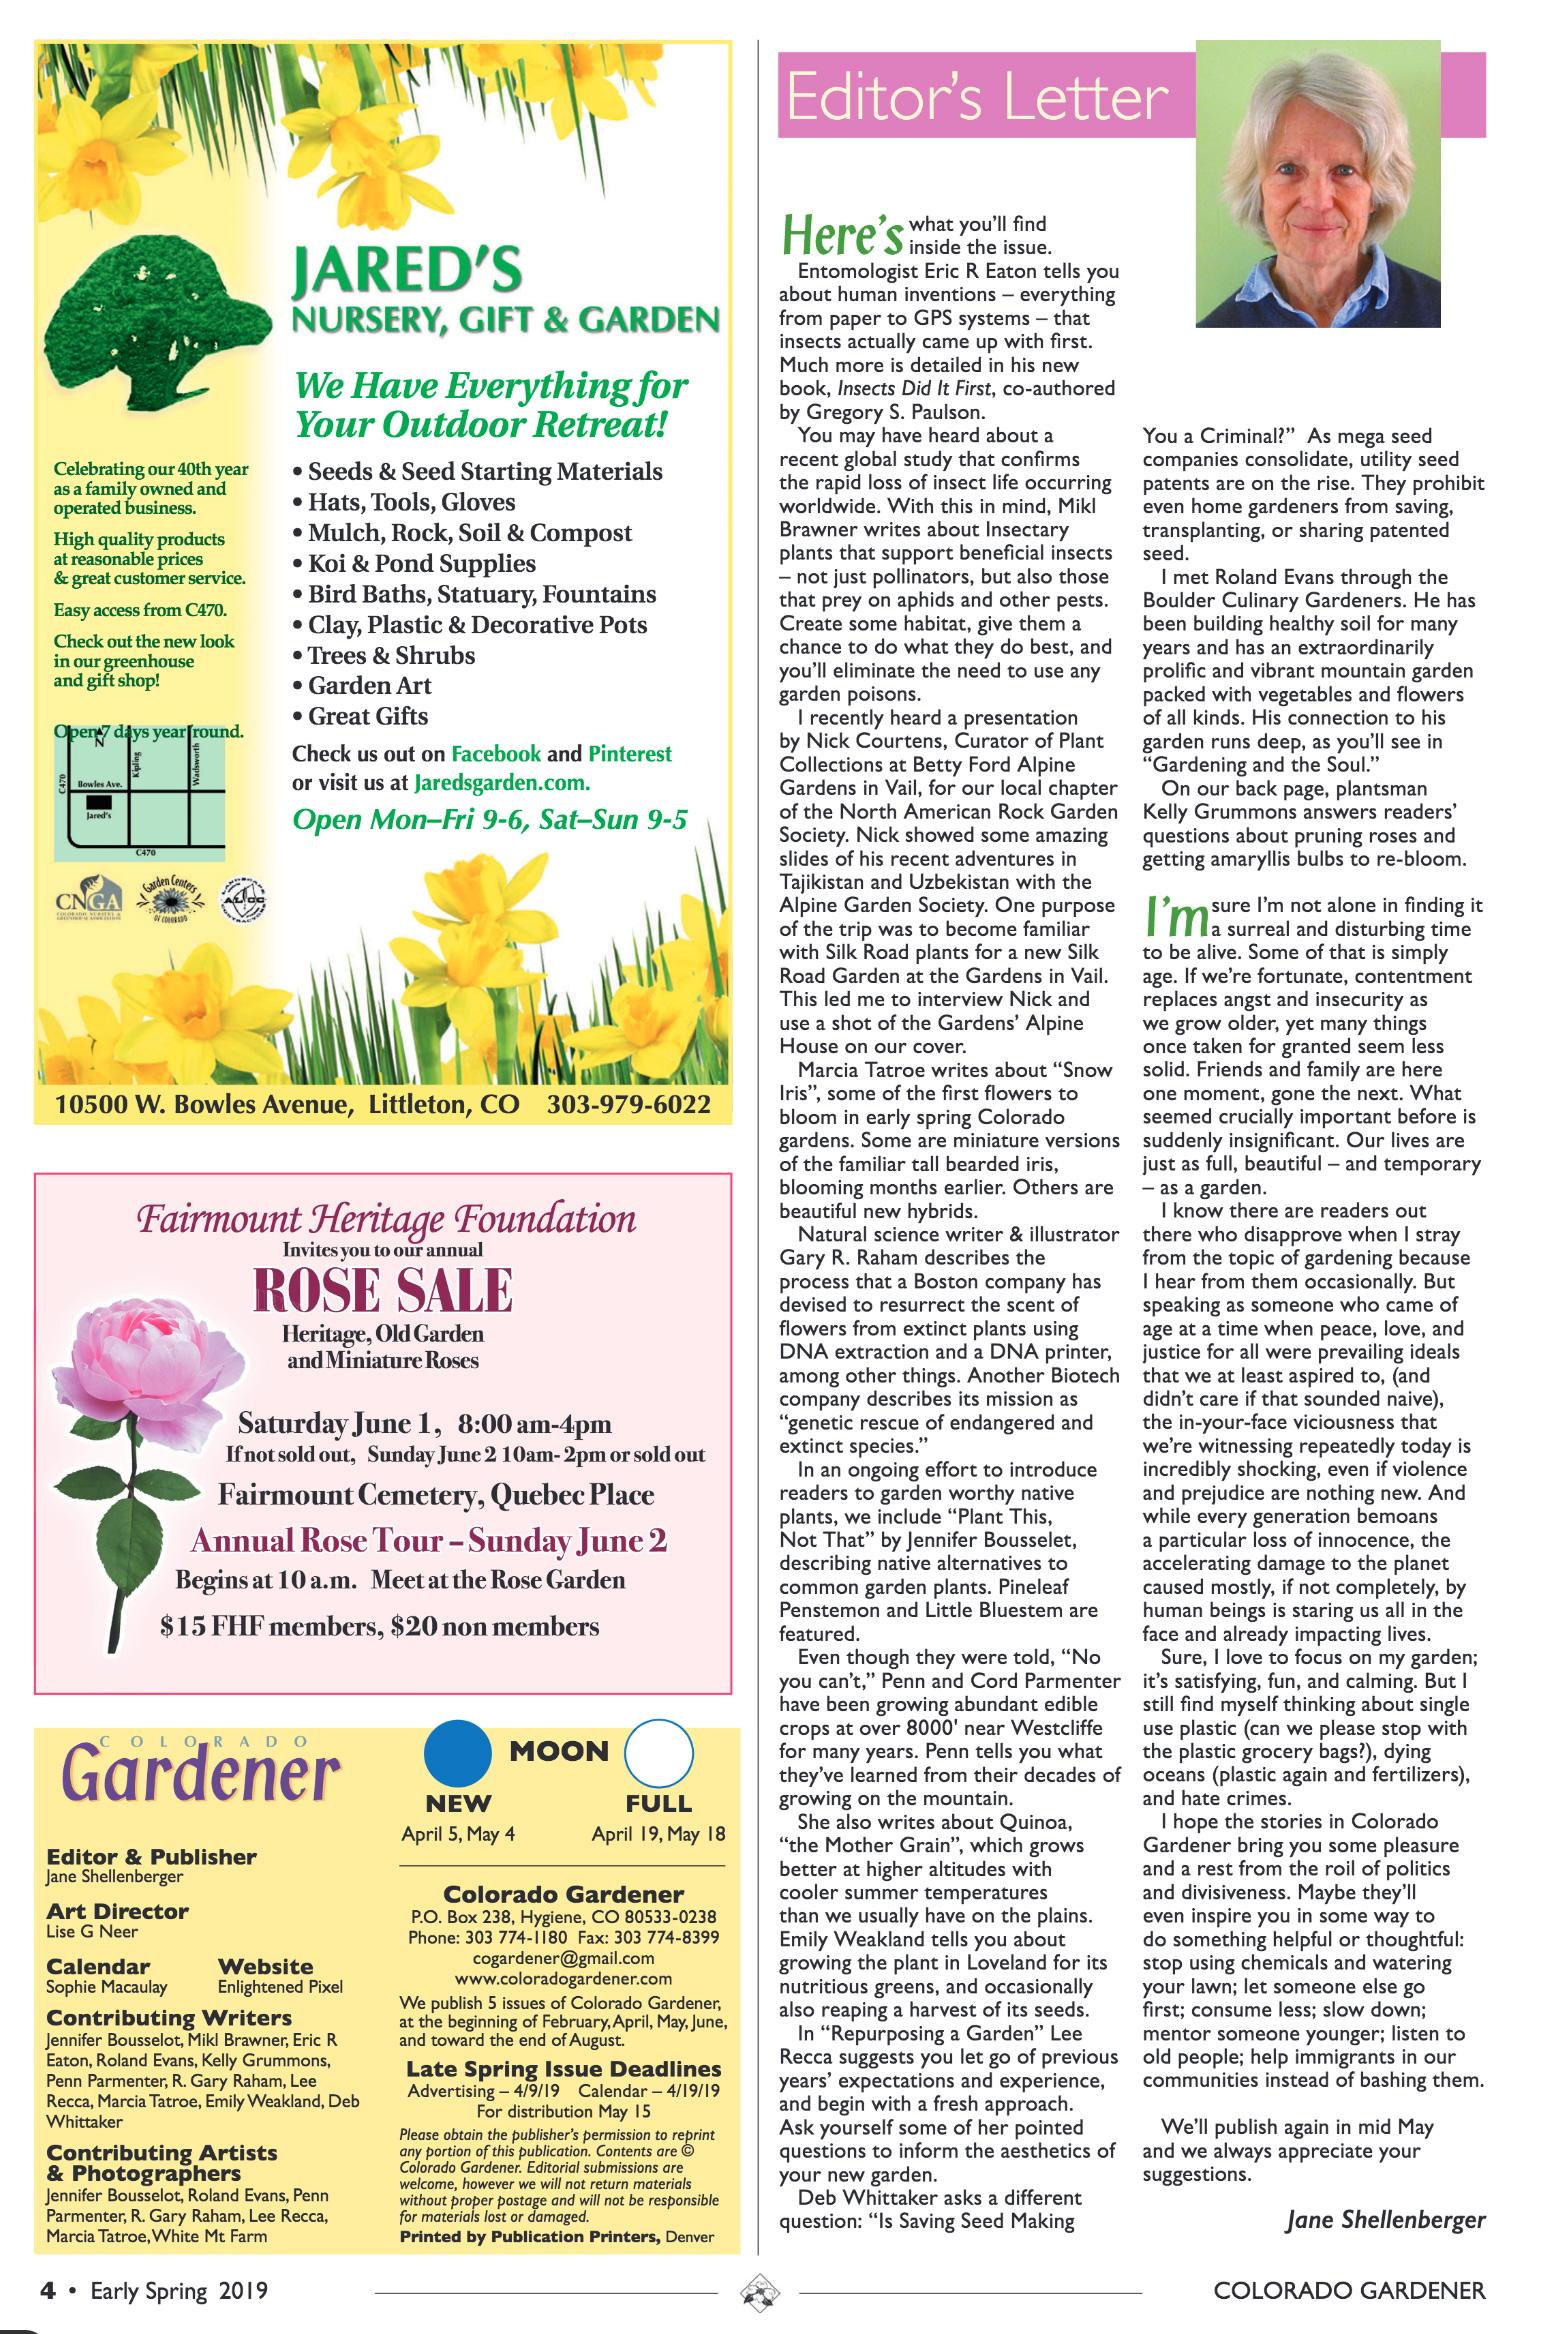 Colorado Gardener Magazine - Spring 2019 - Editor's Letter